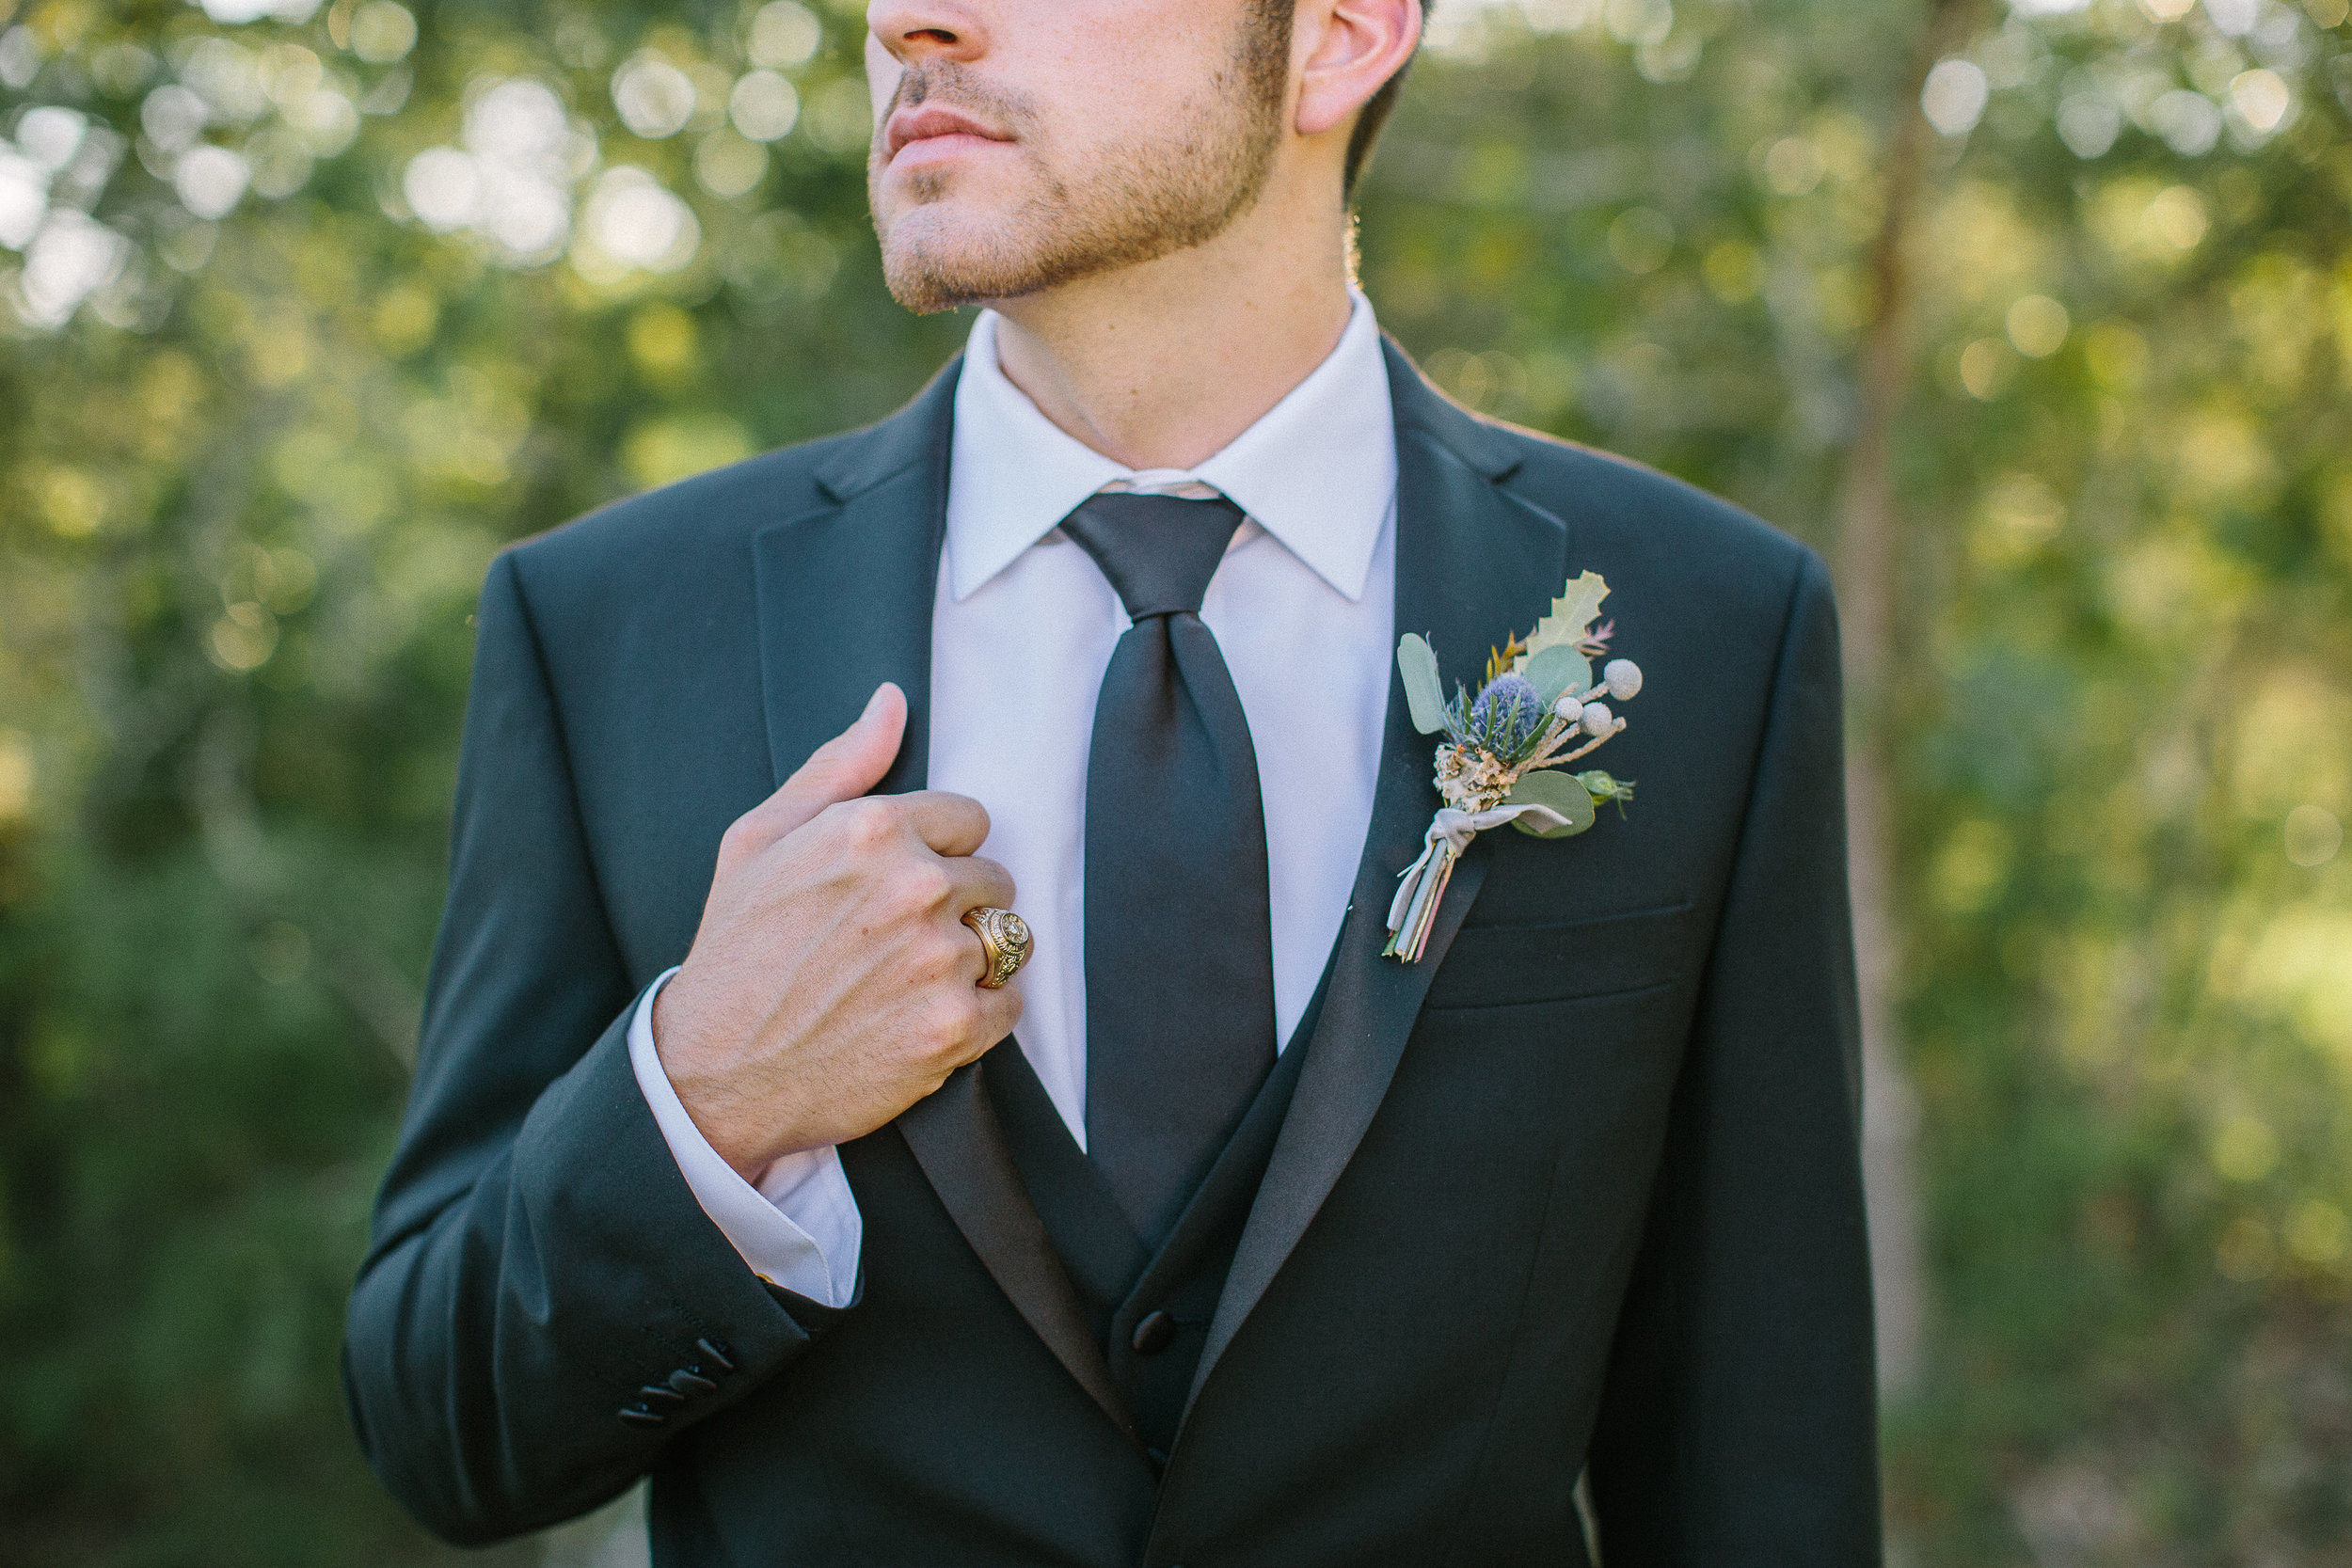 Ellen-Ashton-Photography-Peach-Creek-Ranch-Weddings-Wed-and-Prosper207.jpg